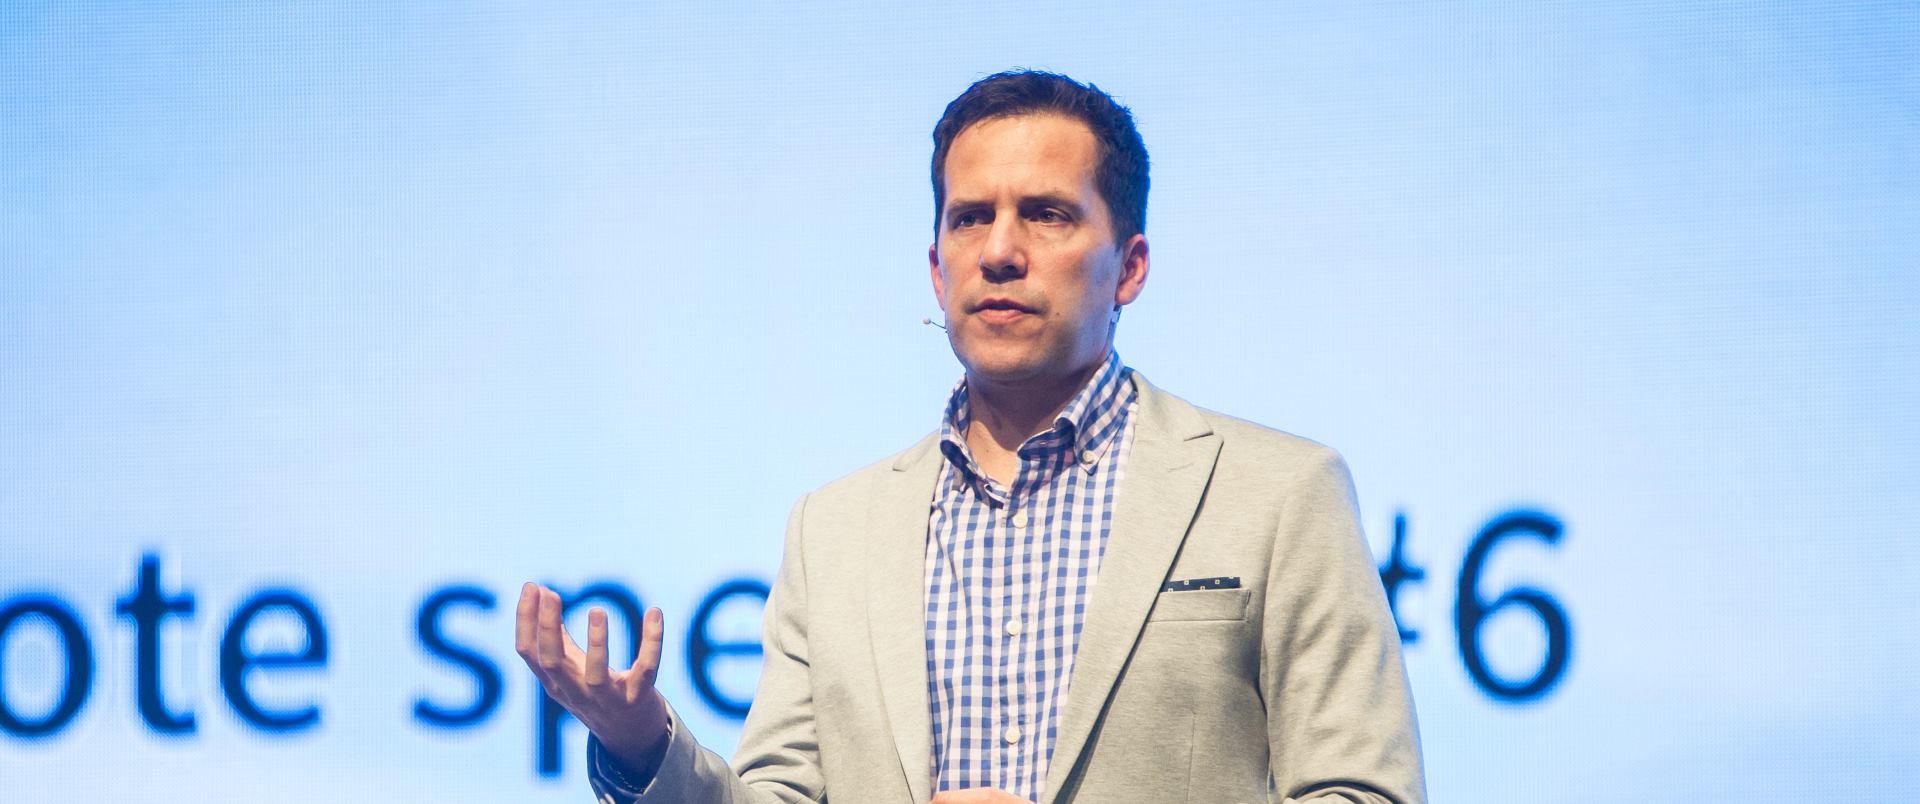 Microsoft predstavio programe za razvoj startupova